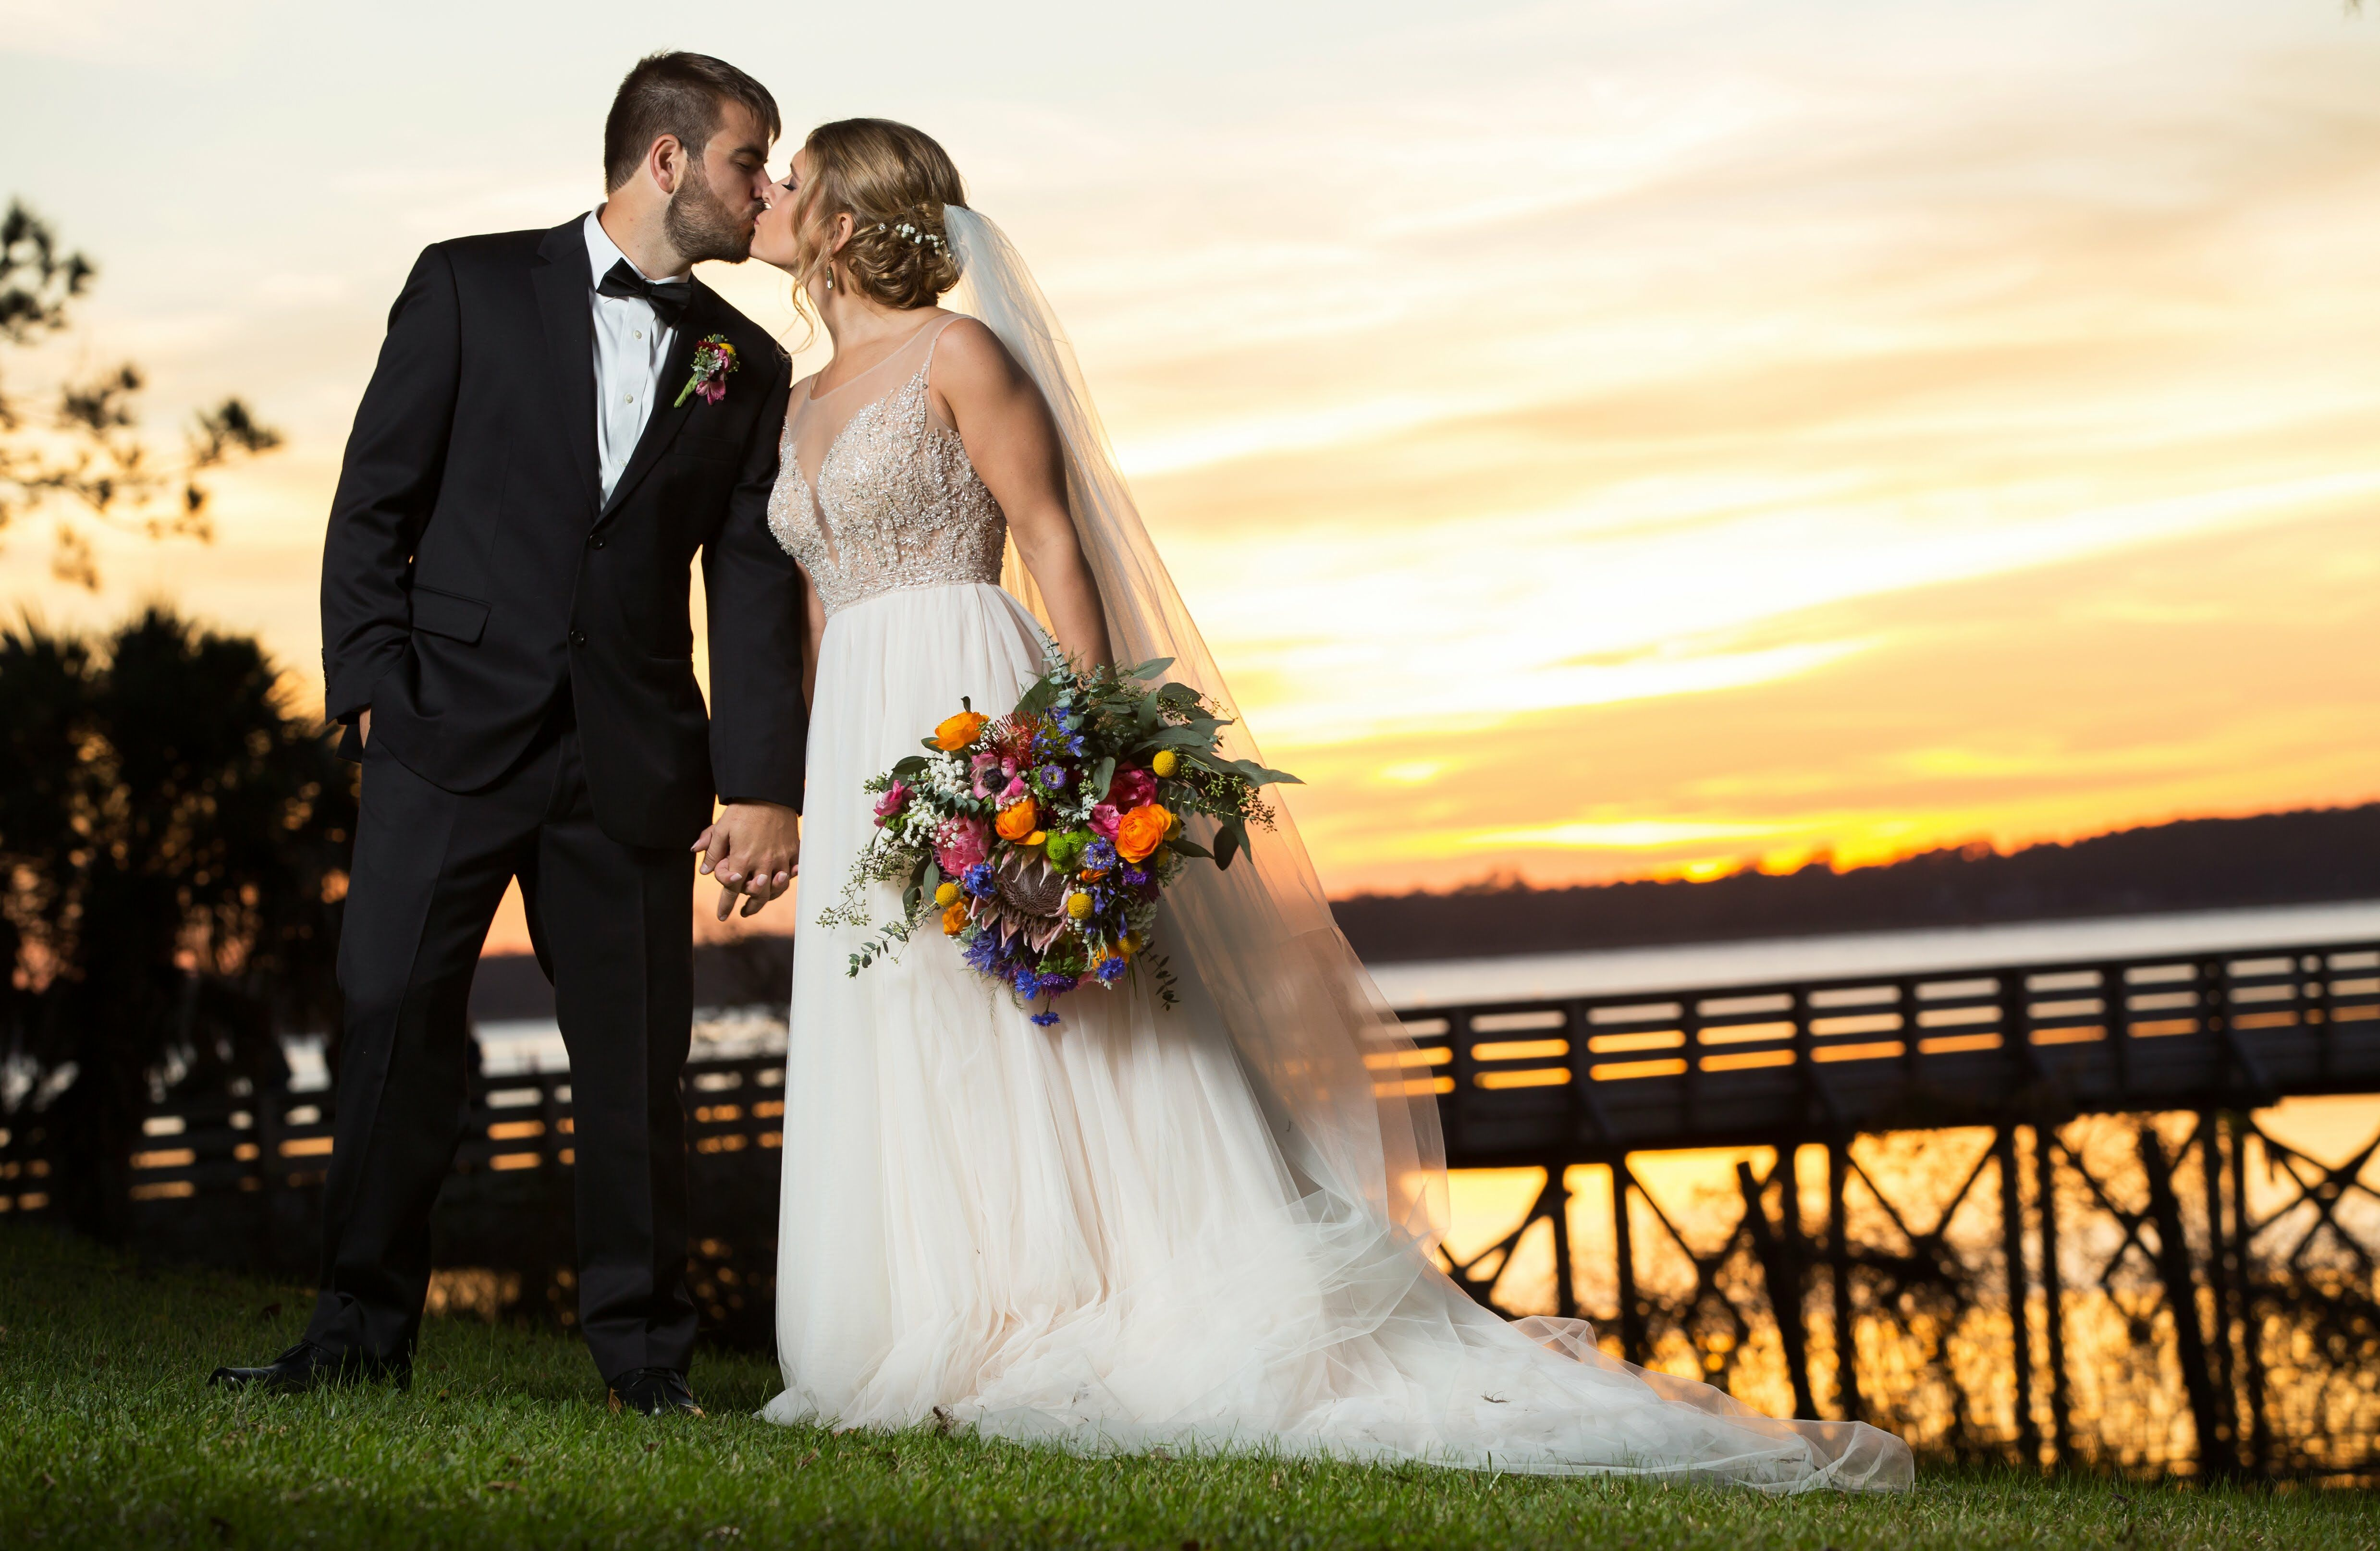 The Little White Dress Bridal Salons Myrtle Beach Sc